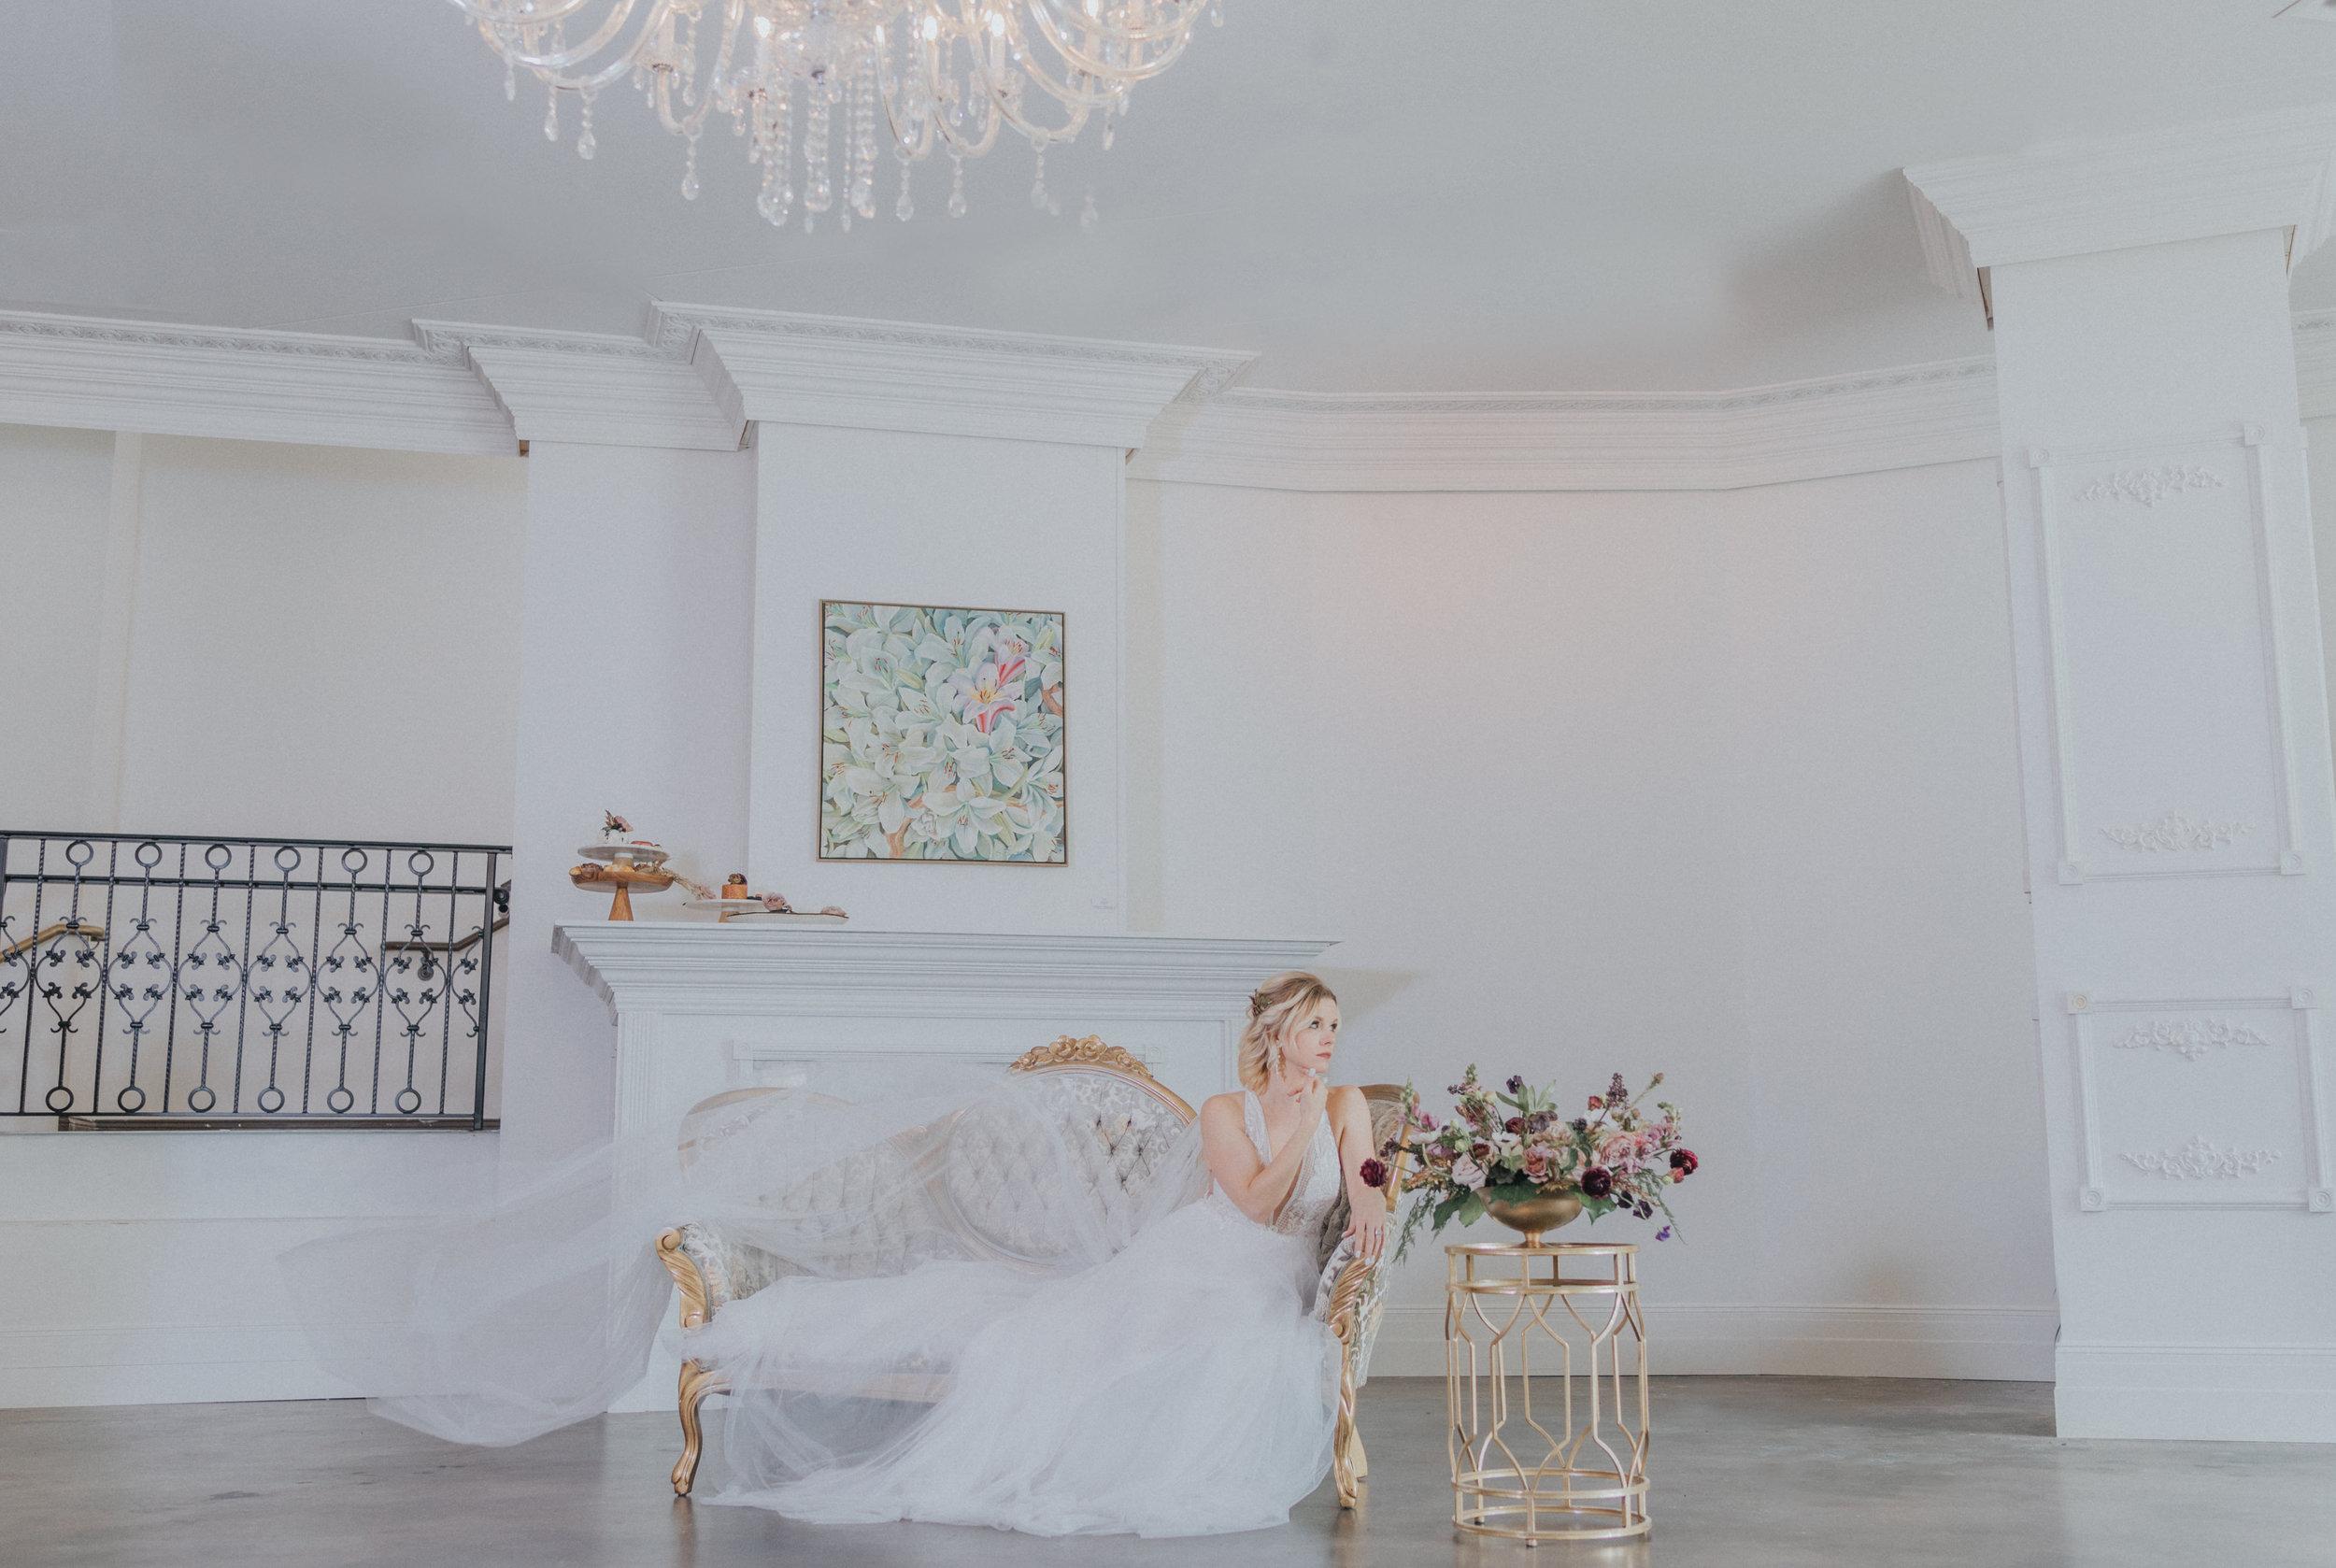 166 tiny-luxe-weddings-omaha-nebraska-midwest-empire-room.jpg